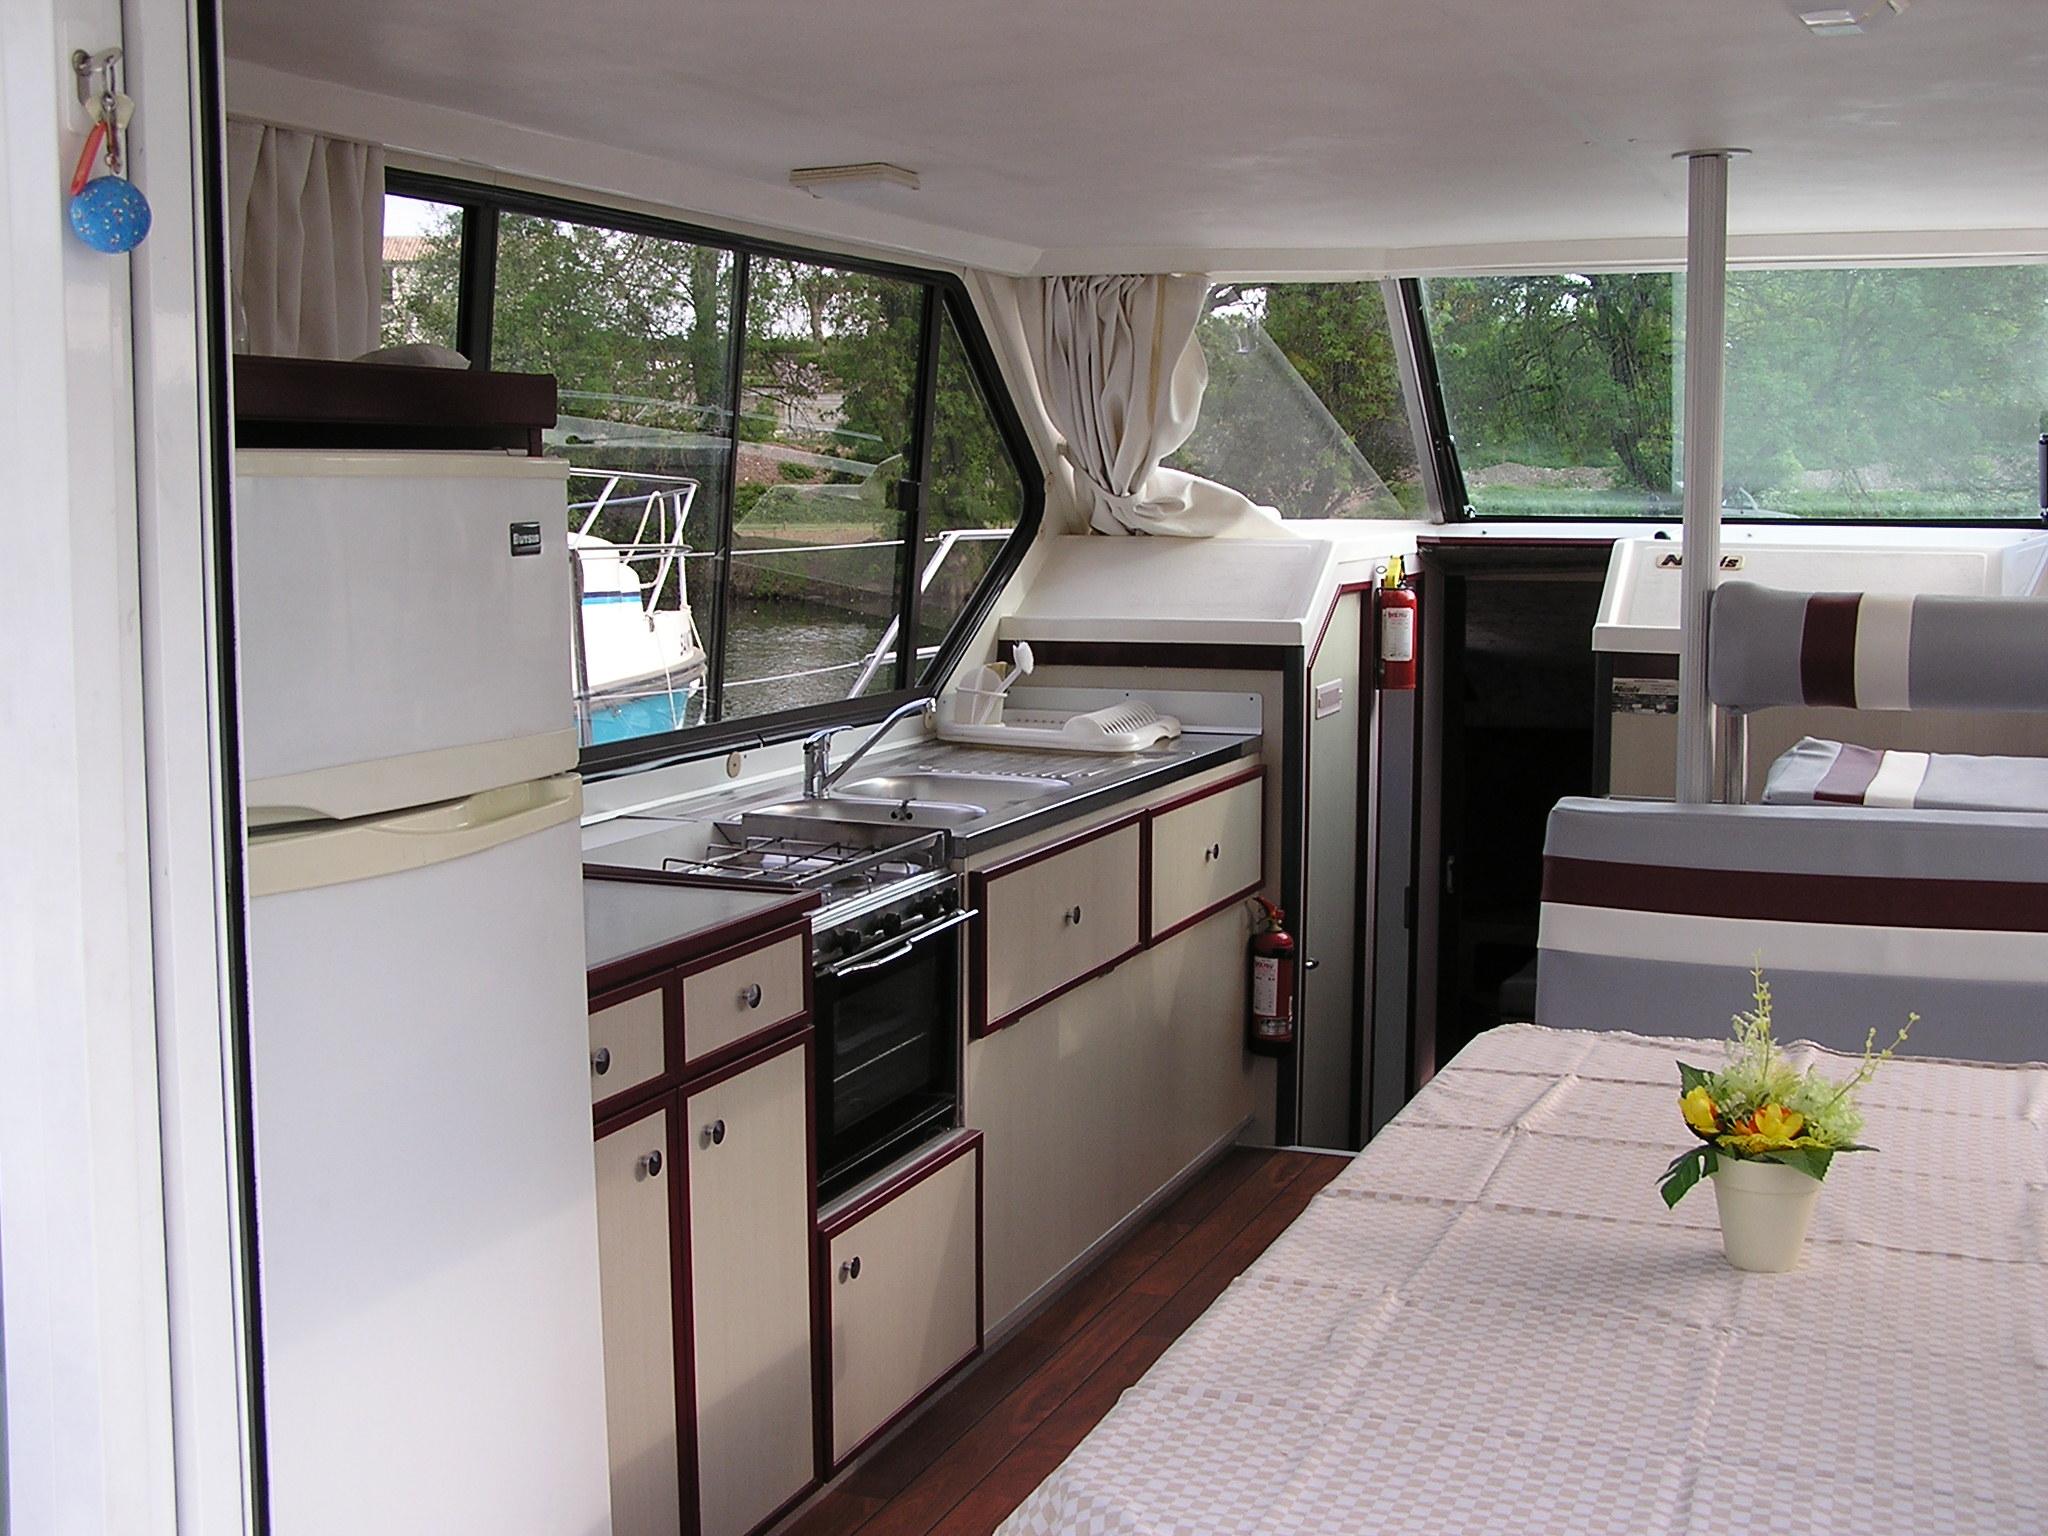 Nicols Sedan 1000 cuisine et sejour sireuil charente intercroisieres.jpg